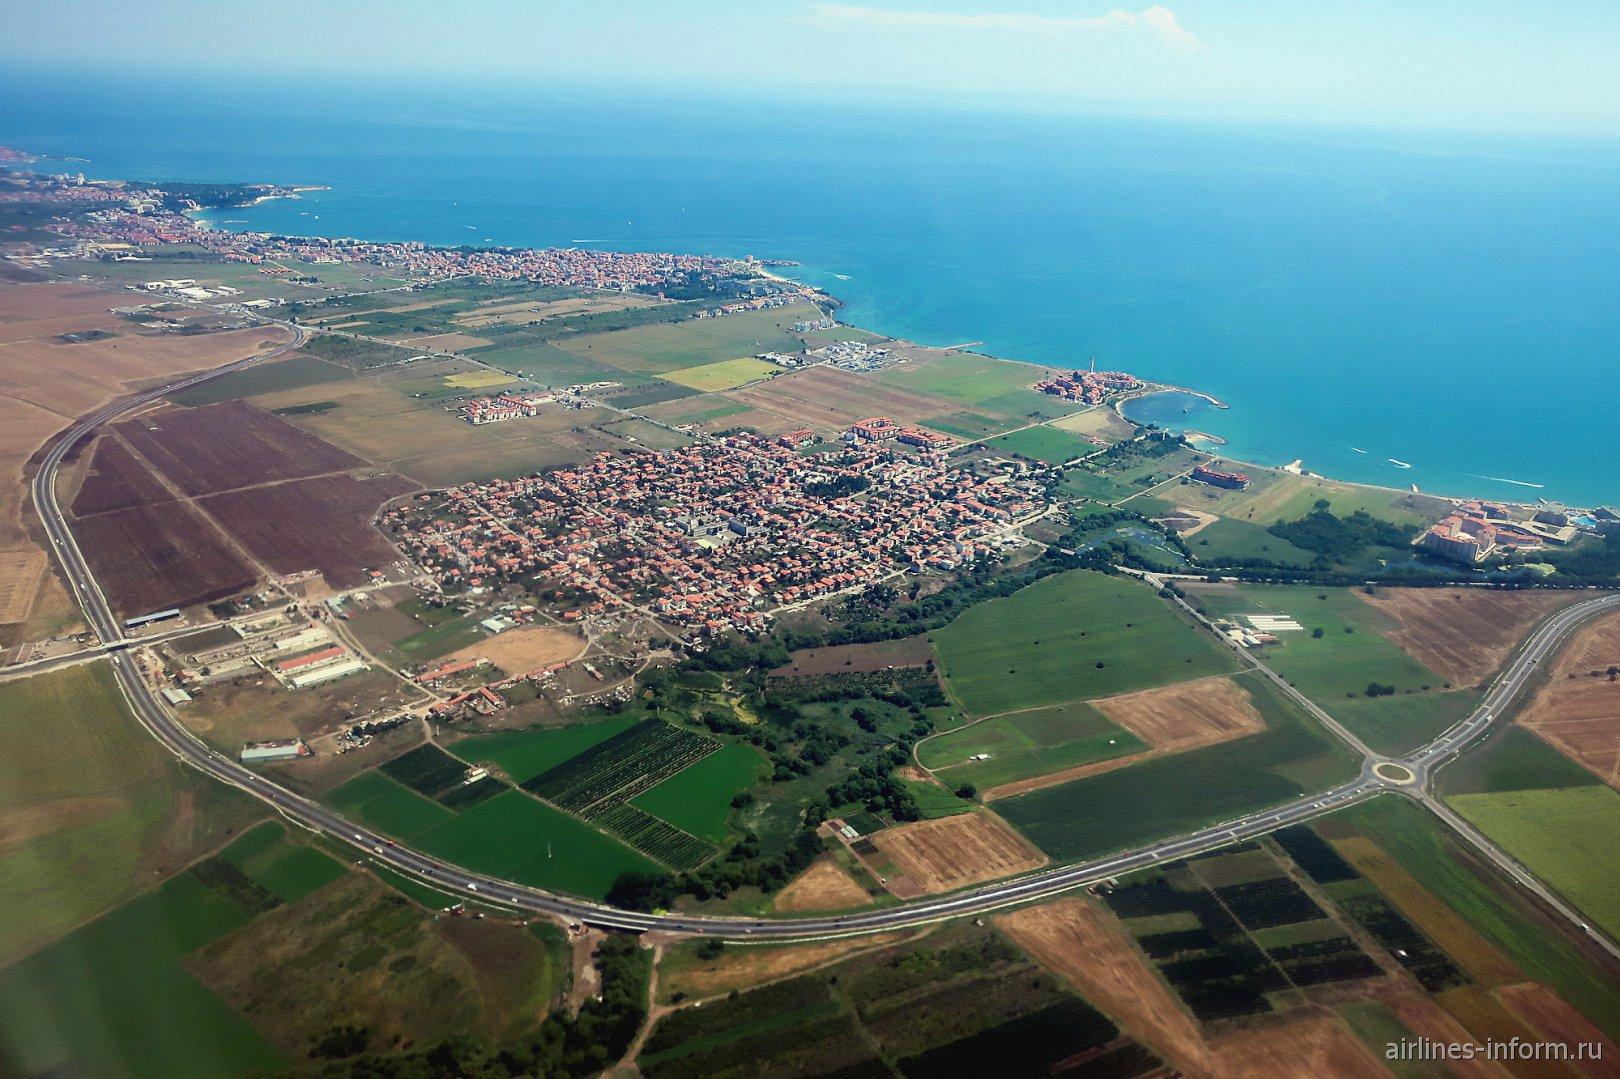 Поселок Ахелой на черноморском побережье Болгарии